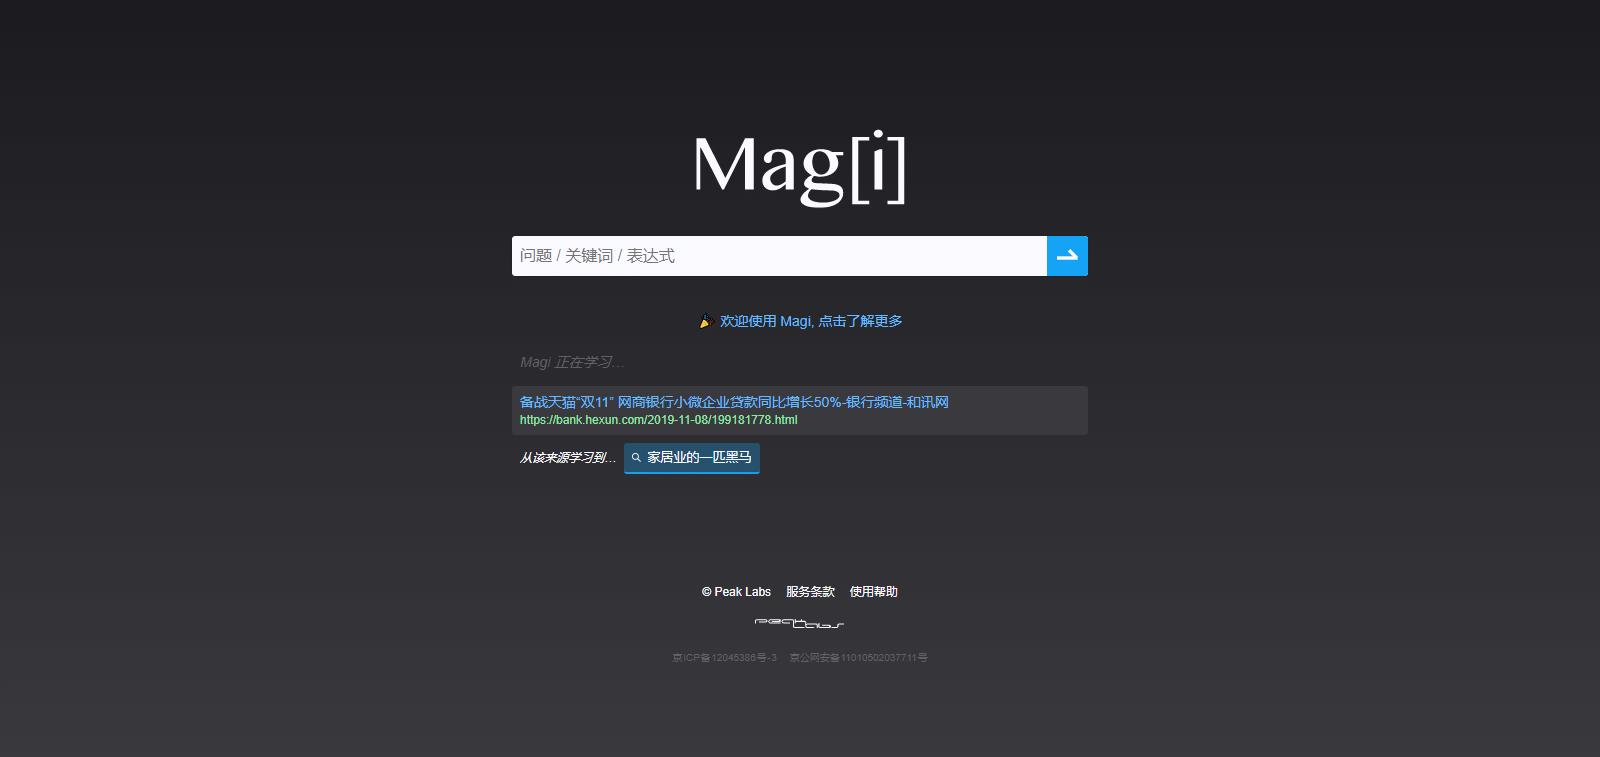 Magi-人工智能搜索引擎